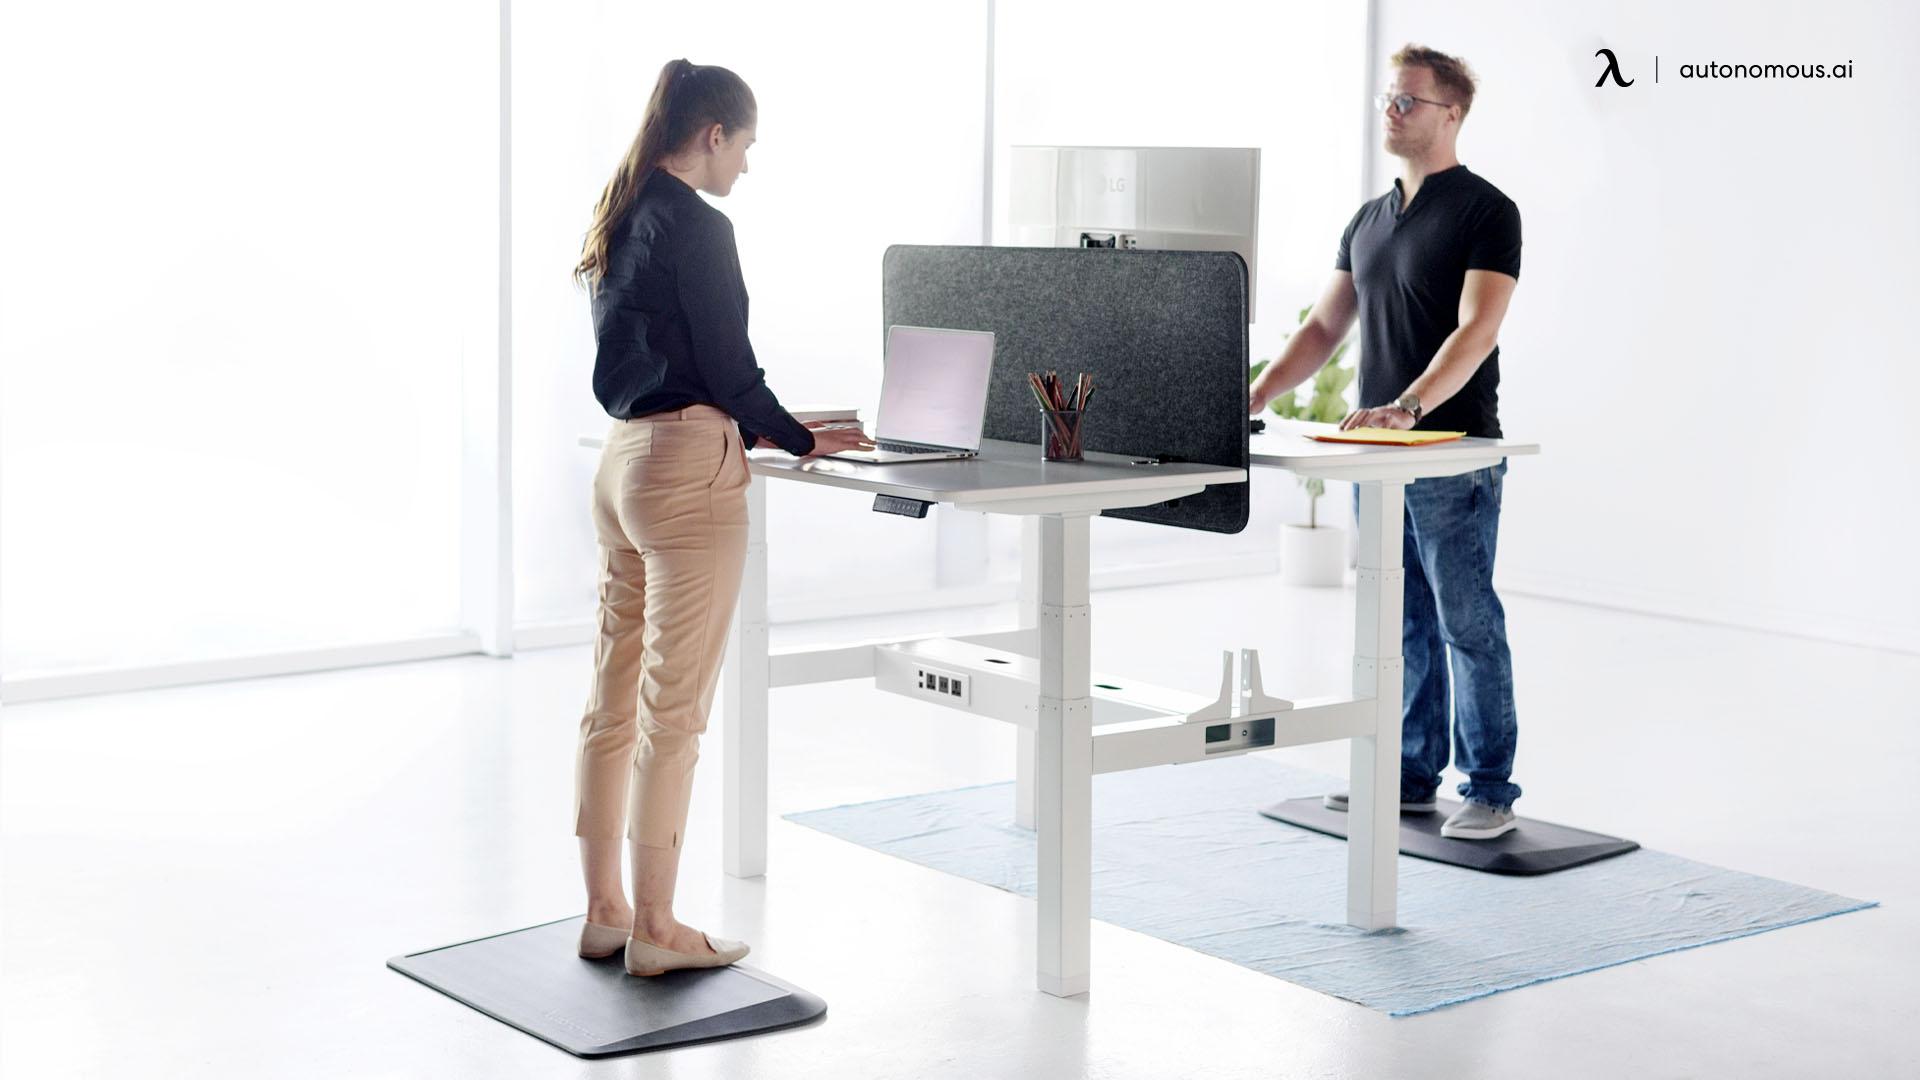 Standing with poor posture